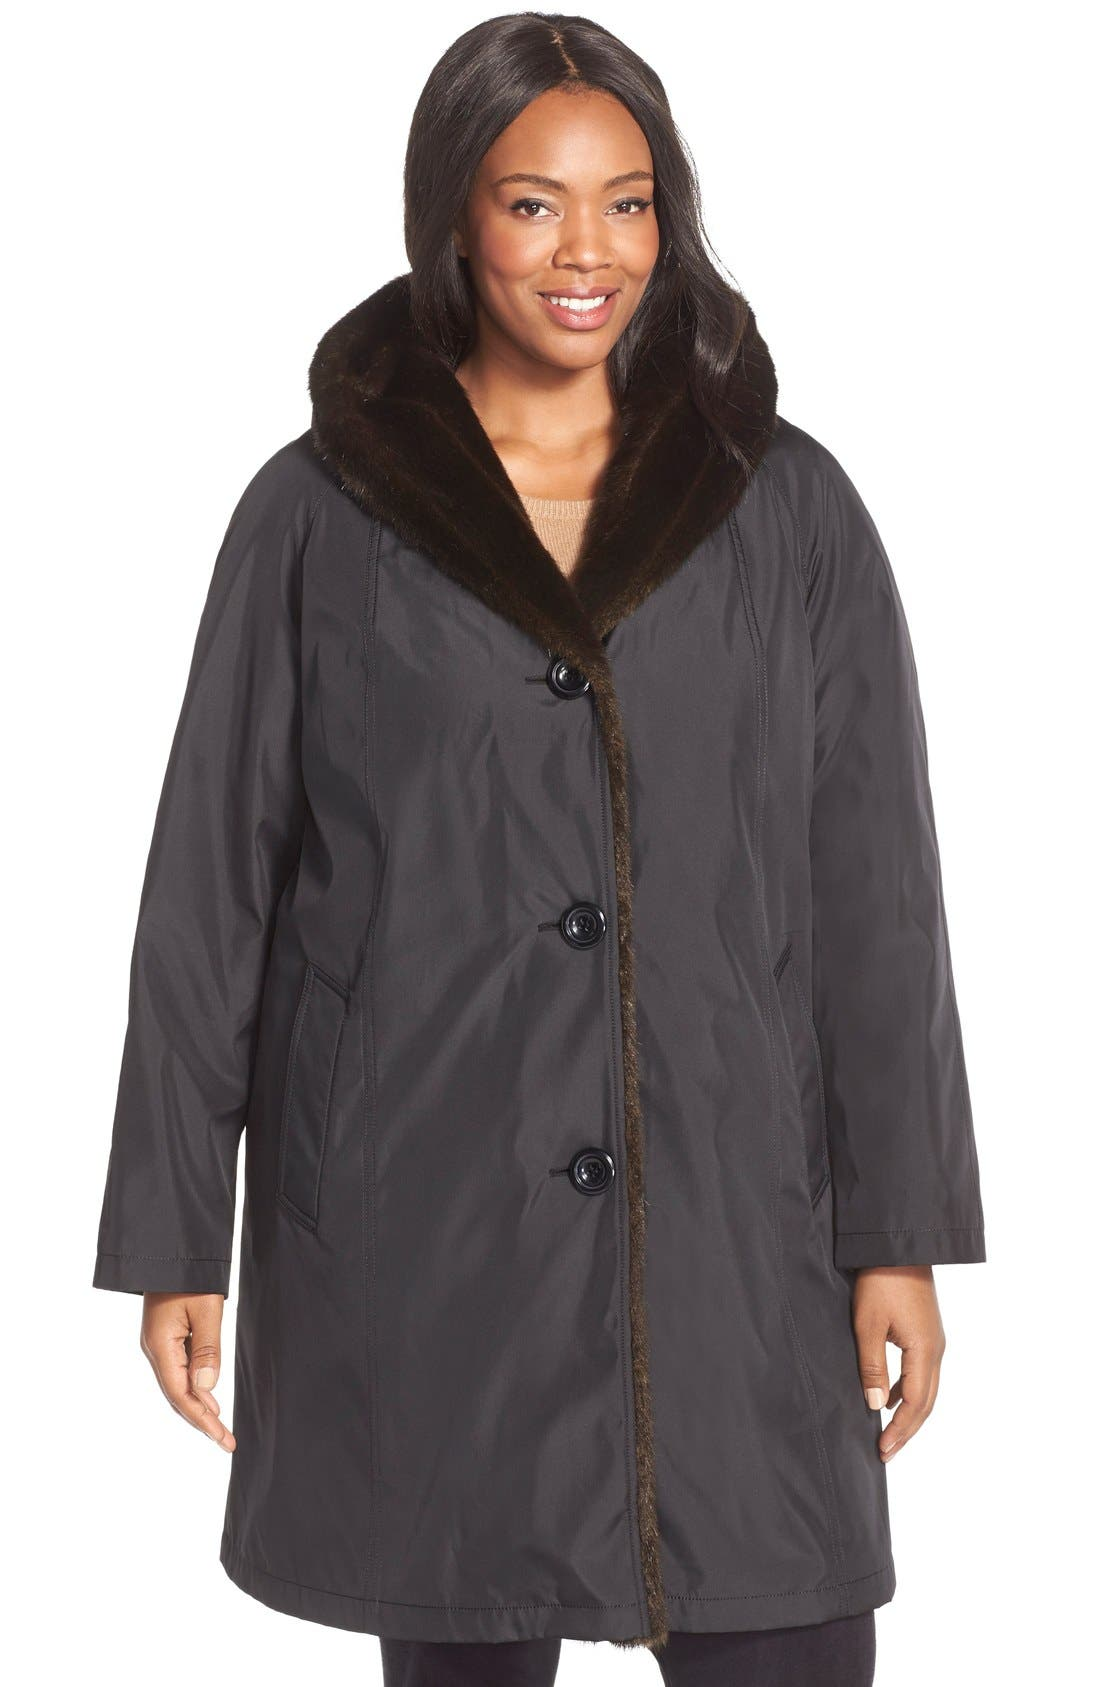 A-Line Storm Coat with FauxFur Lining & Trim, Main, color, 001